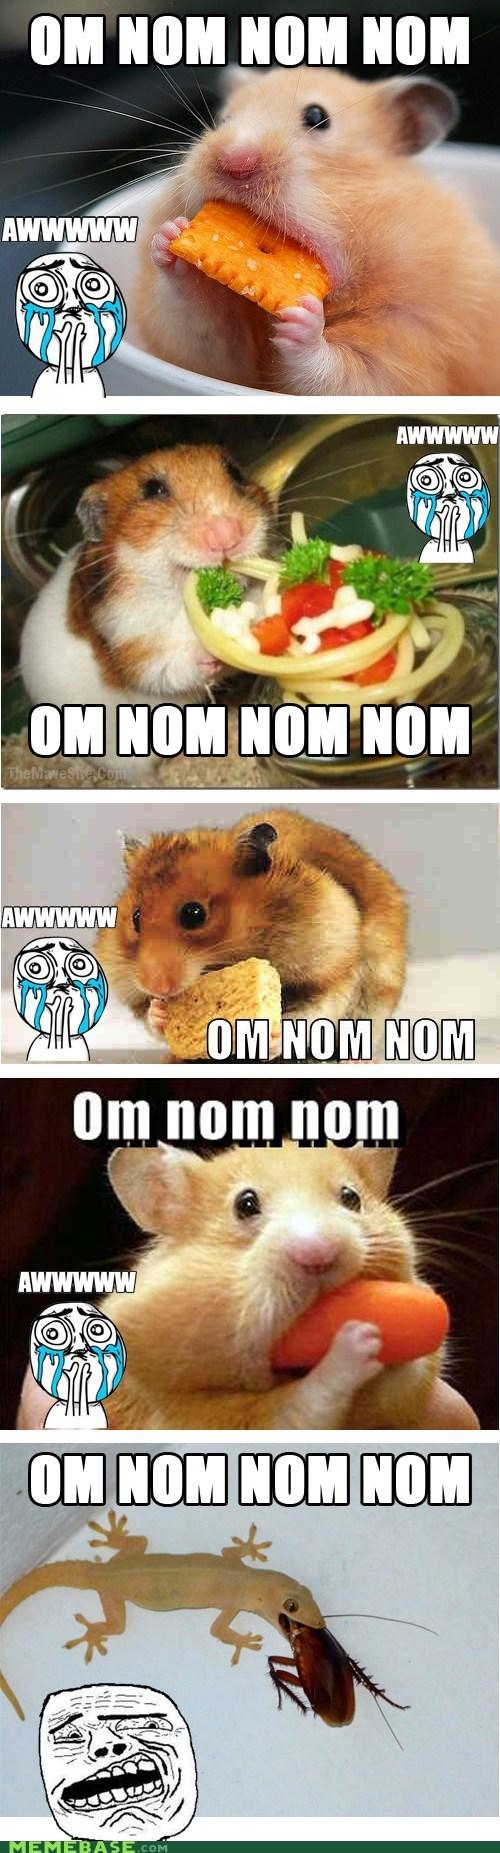 aw bugs cheese hamsters lizard Memes mice om nom nom sweet terror - 6392658688